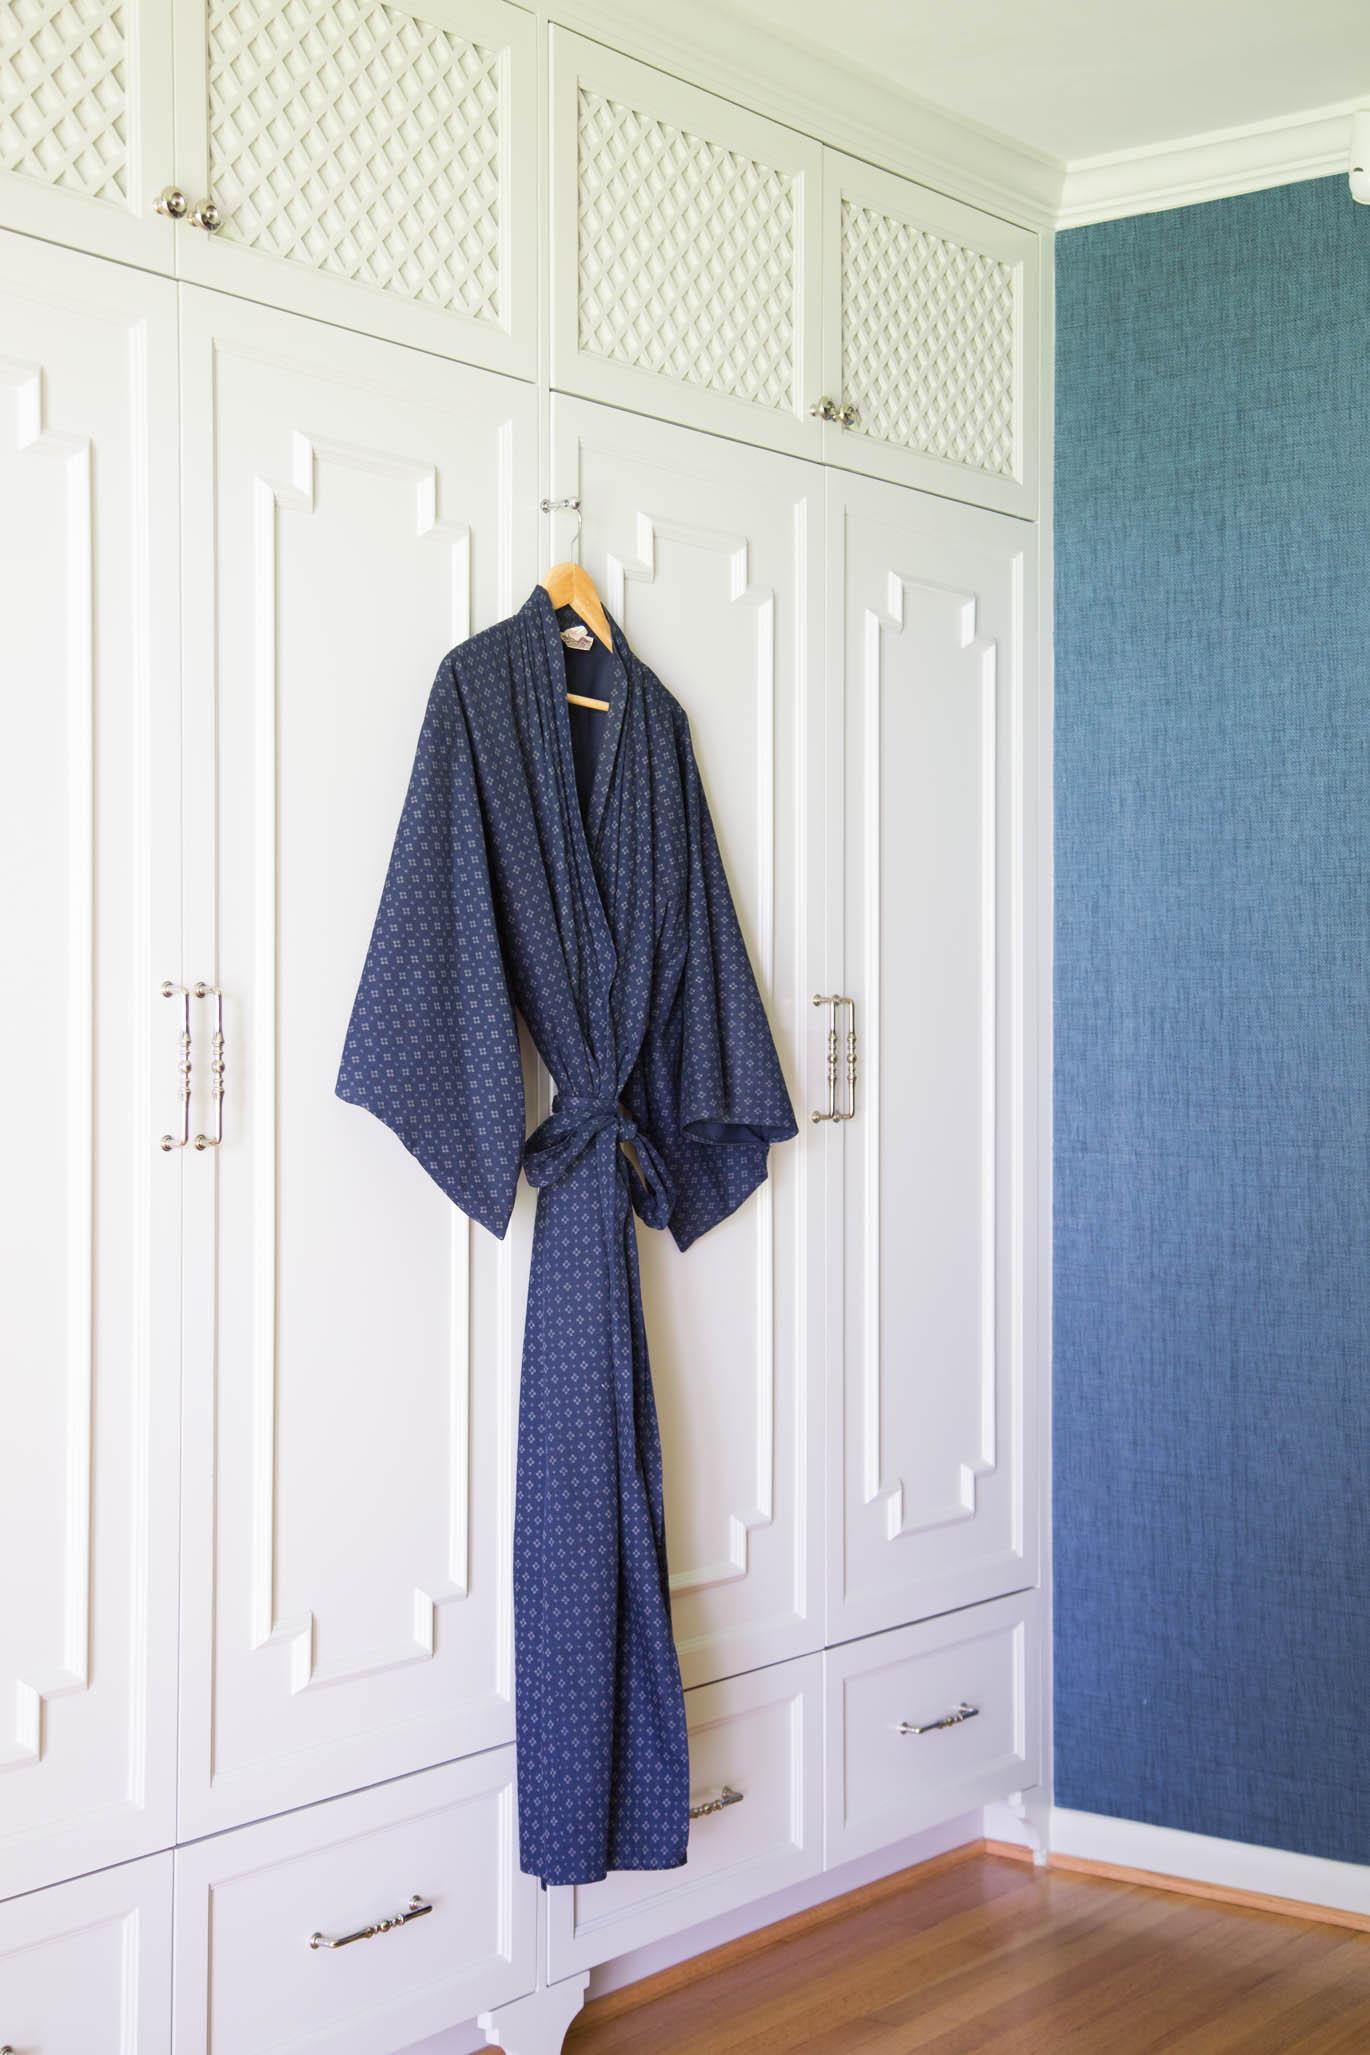 Wardrobe style built-in custom closets with chinoiserie onlay design, Designer: Carla Aston